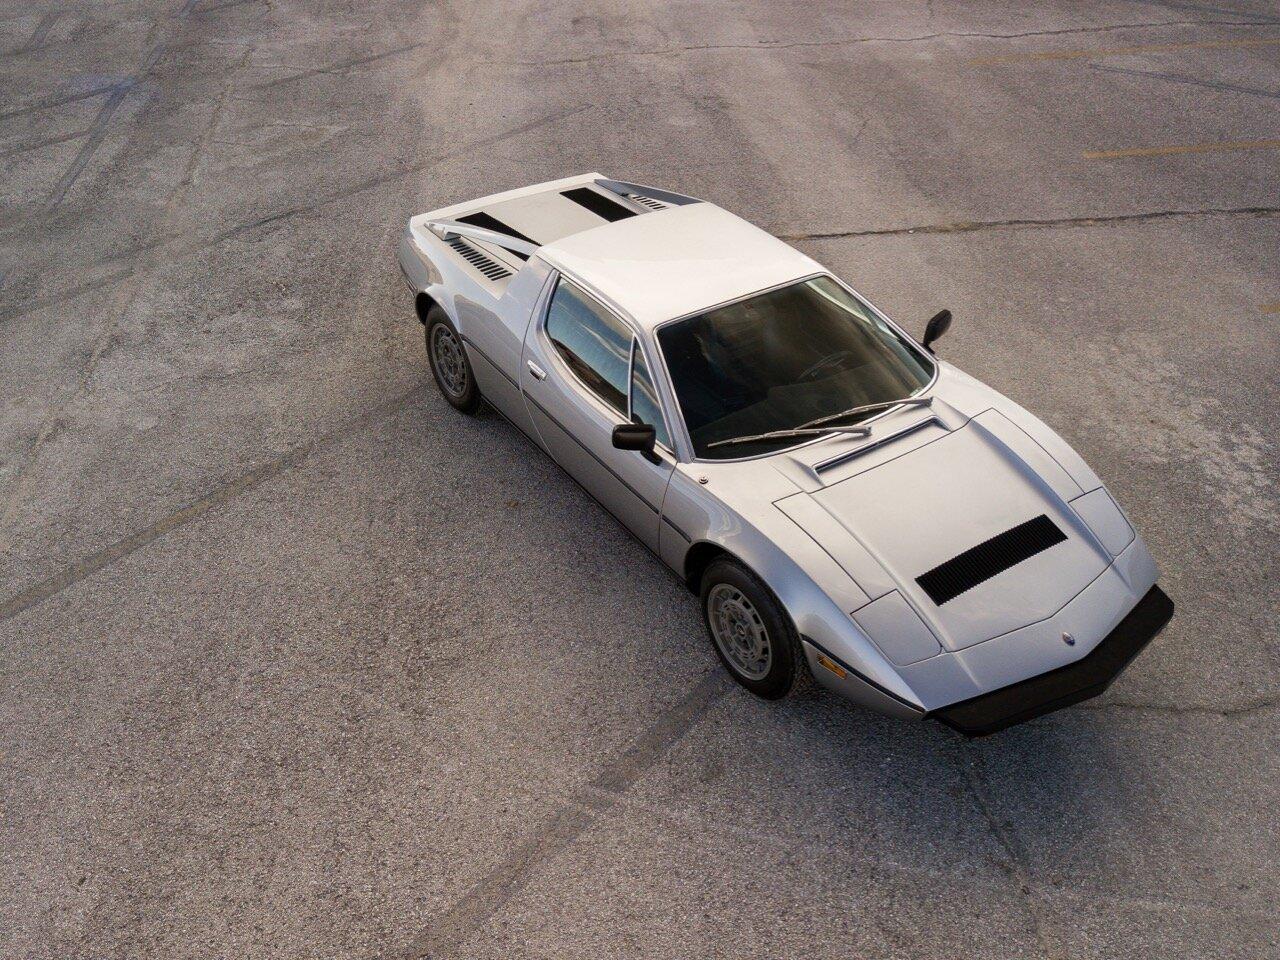 1977 Maserati Merak SS (AM122US2210) - 09.jpg